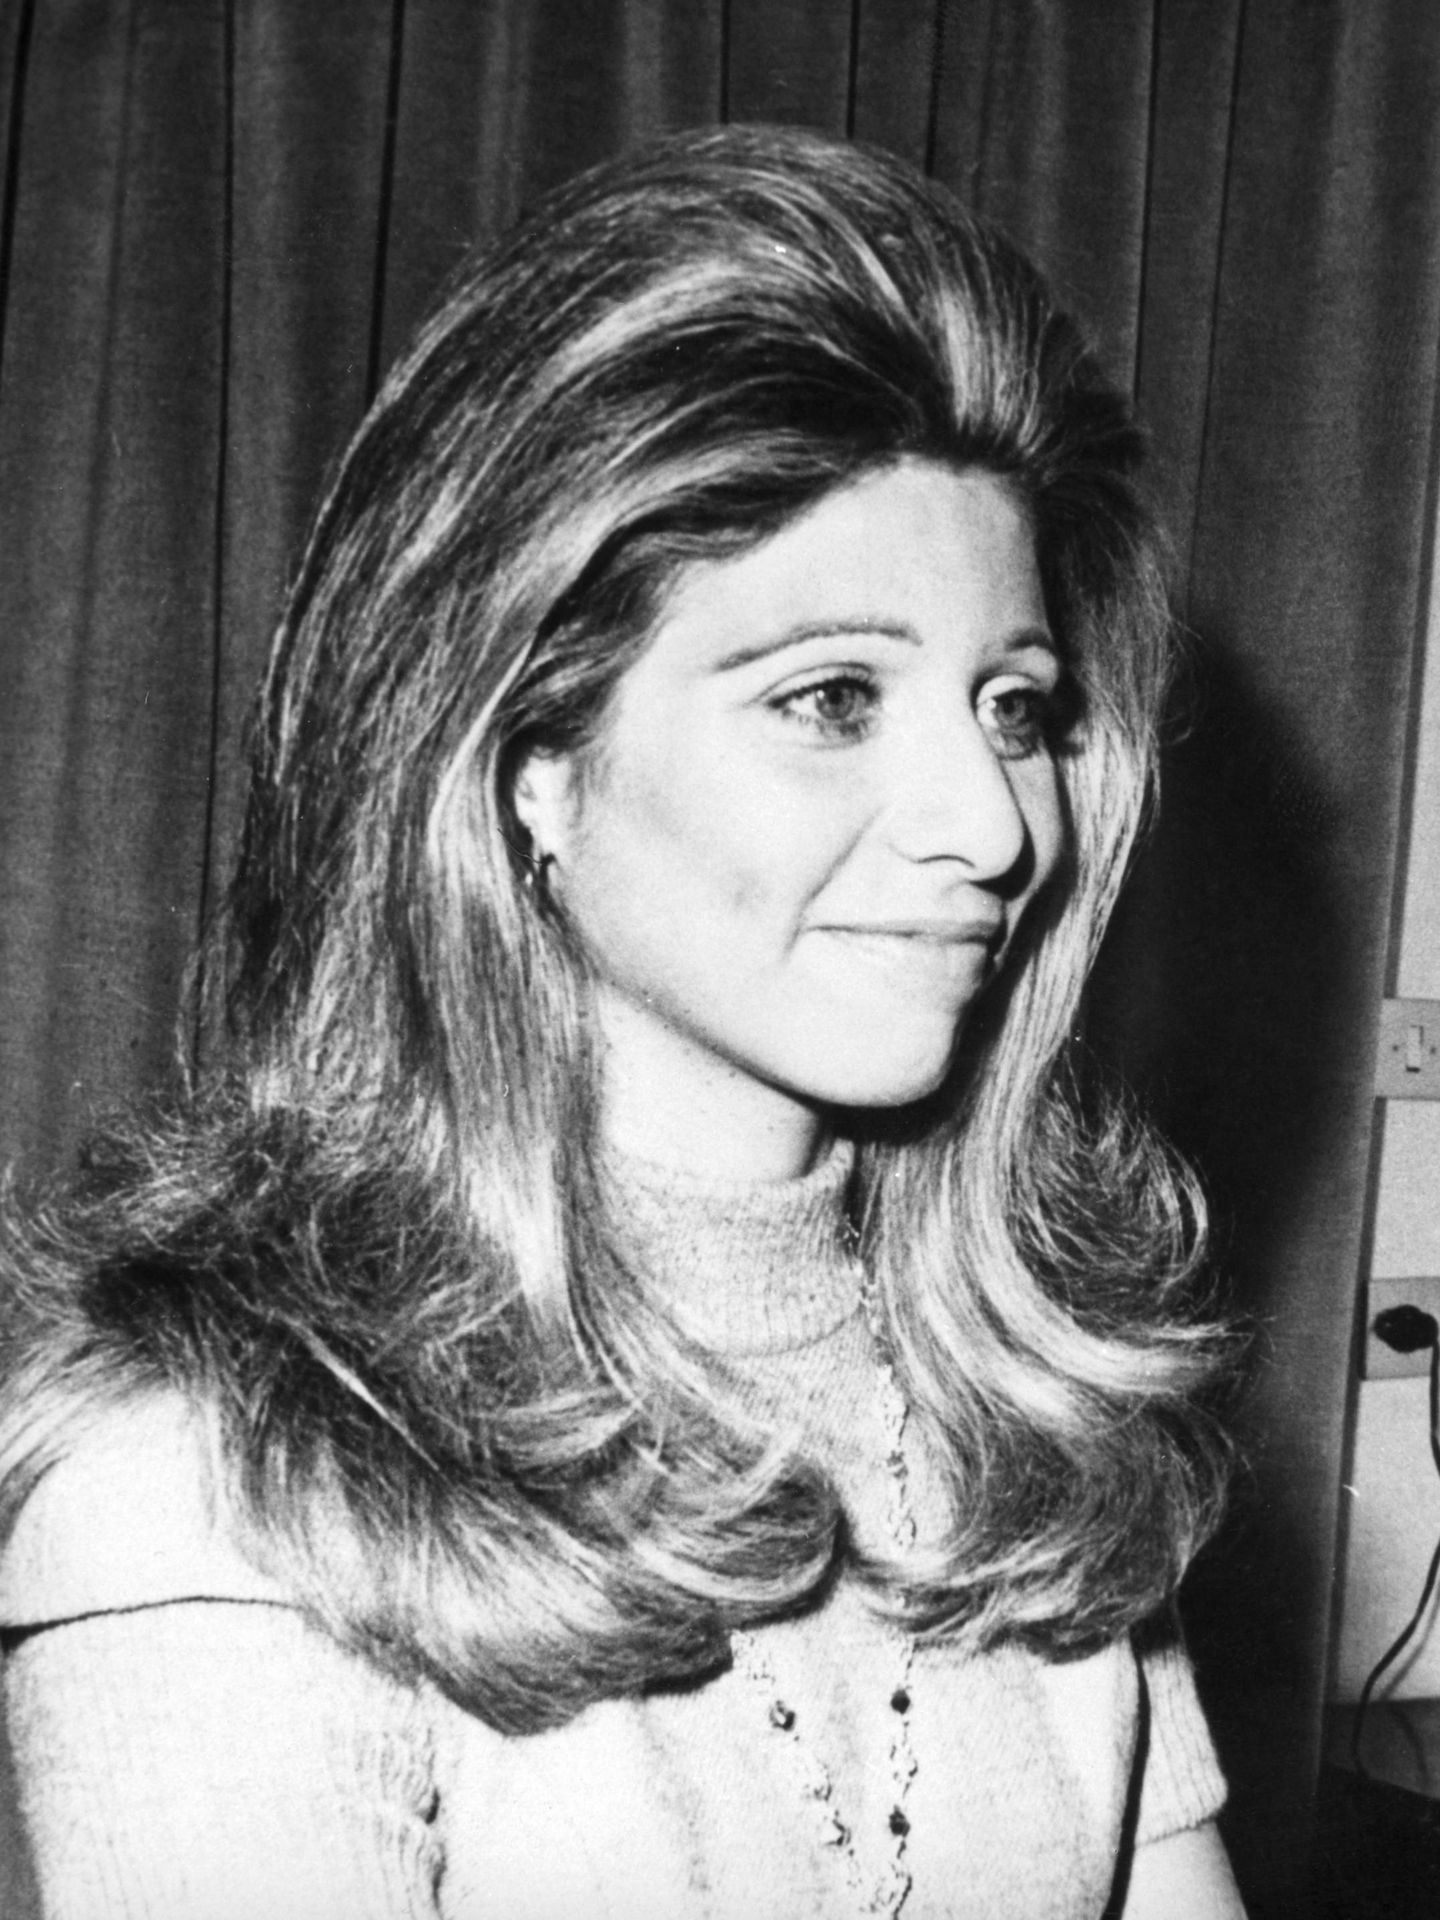 La reina Alia de Jordania, en 1976, un año antes de su muerte. (Cordon Press)